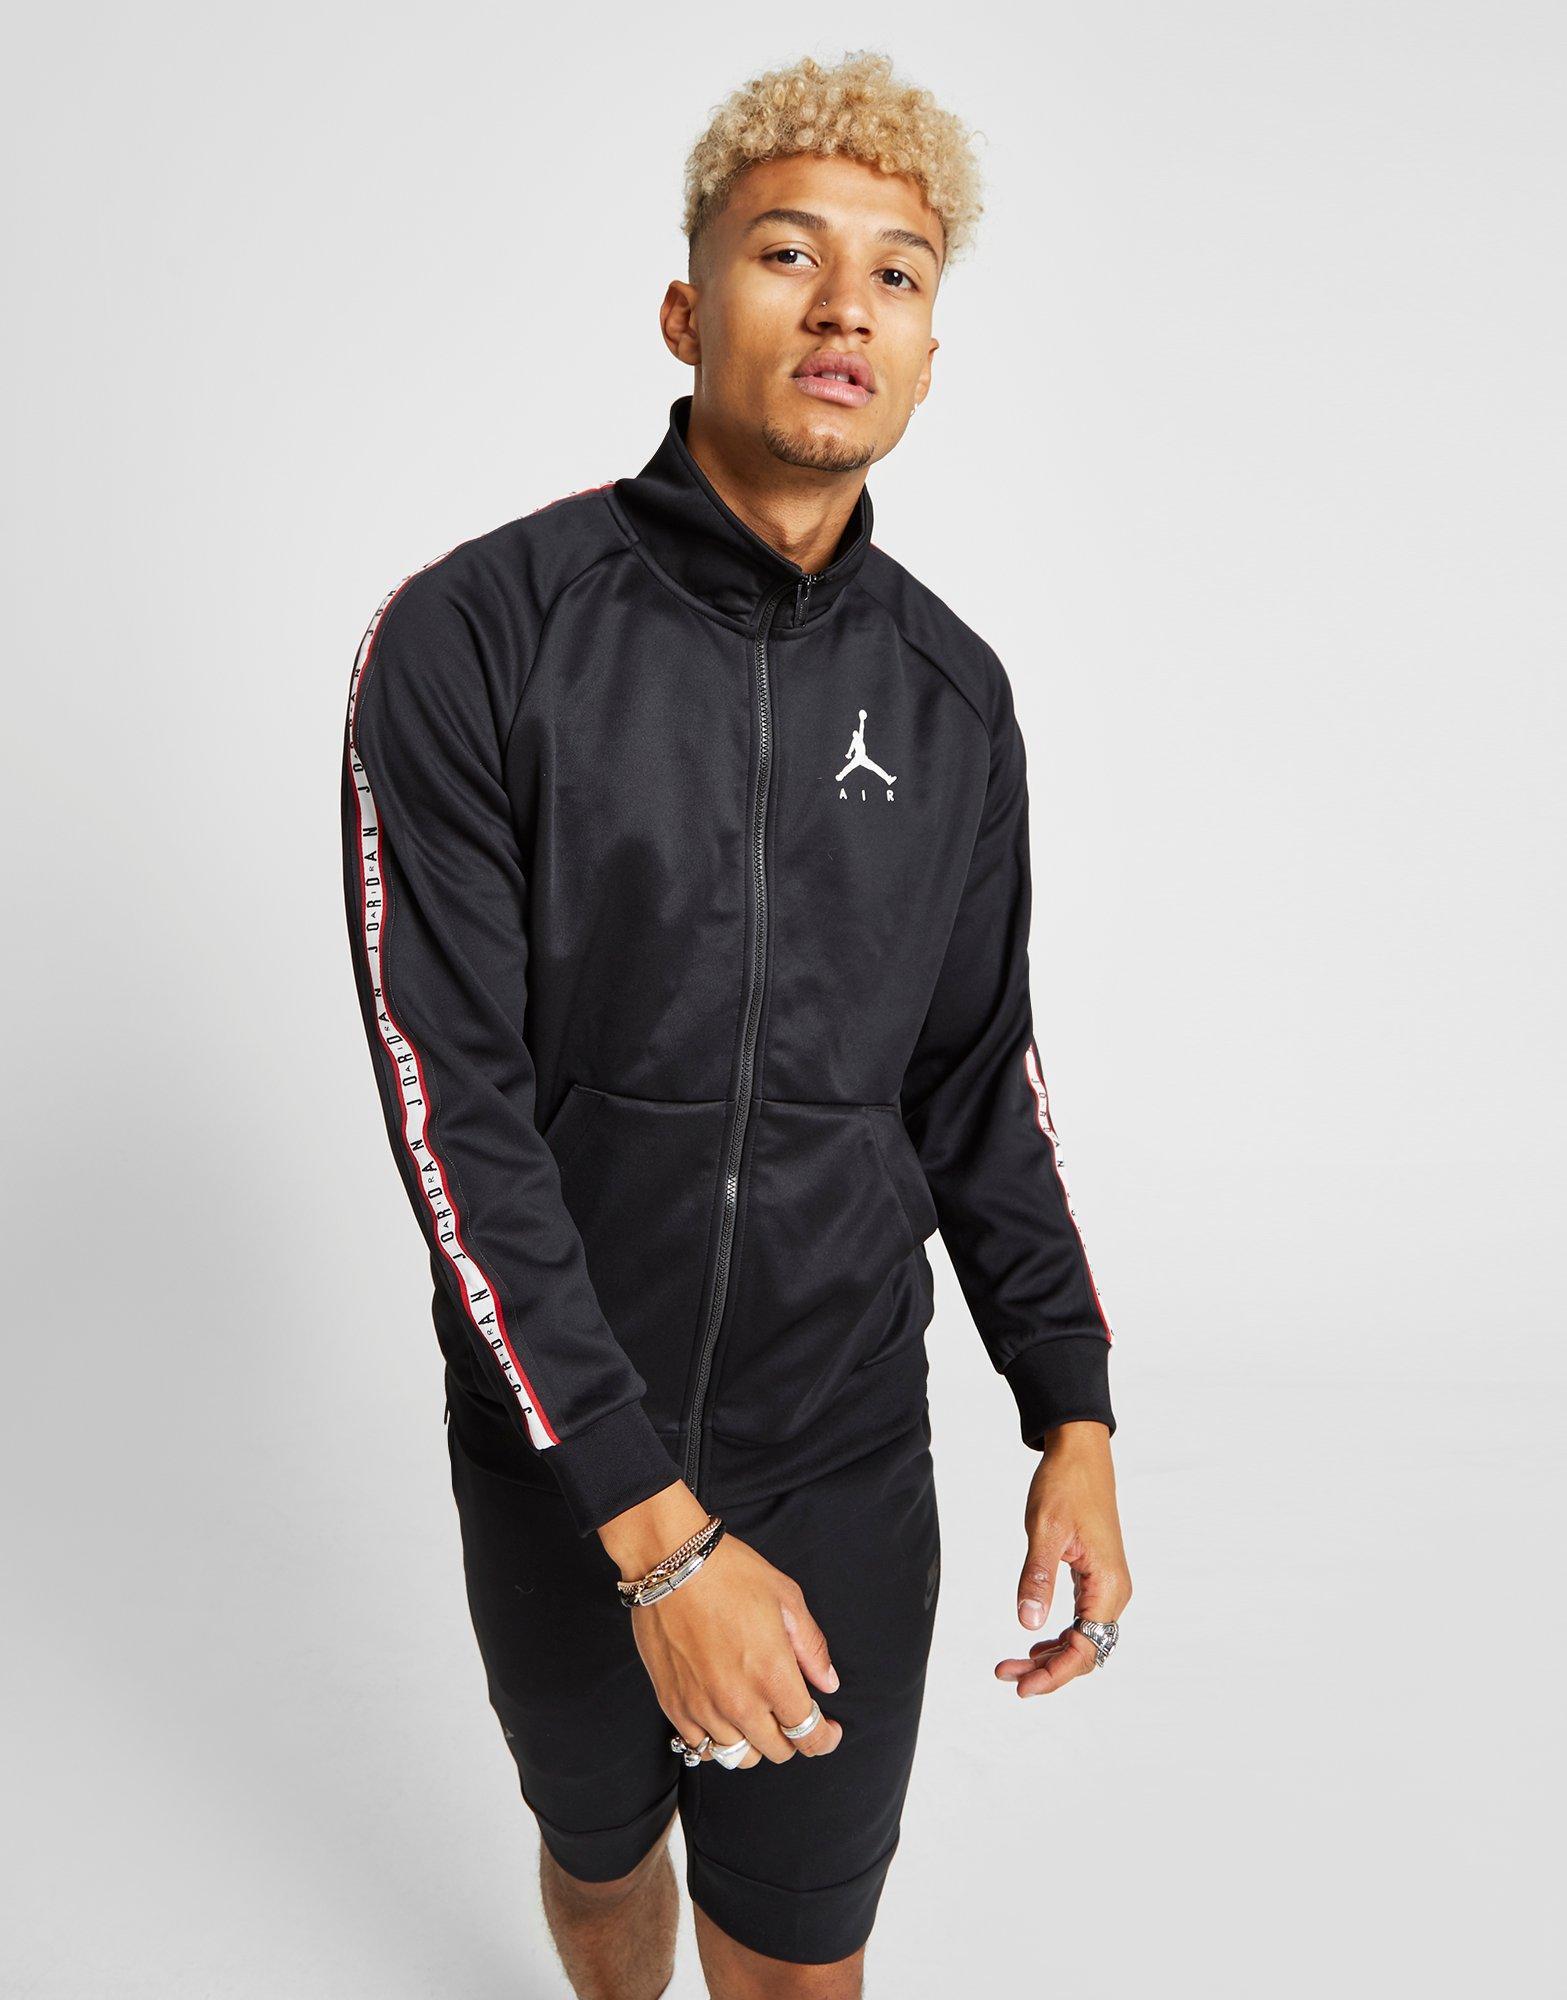 jordan tape jacket cheapest 4c5a7 dd81c